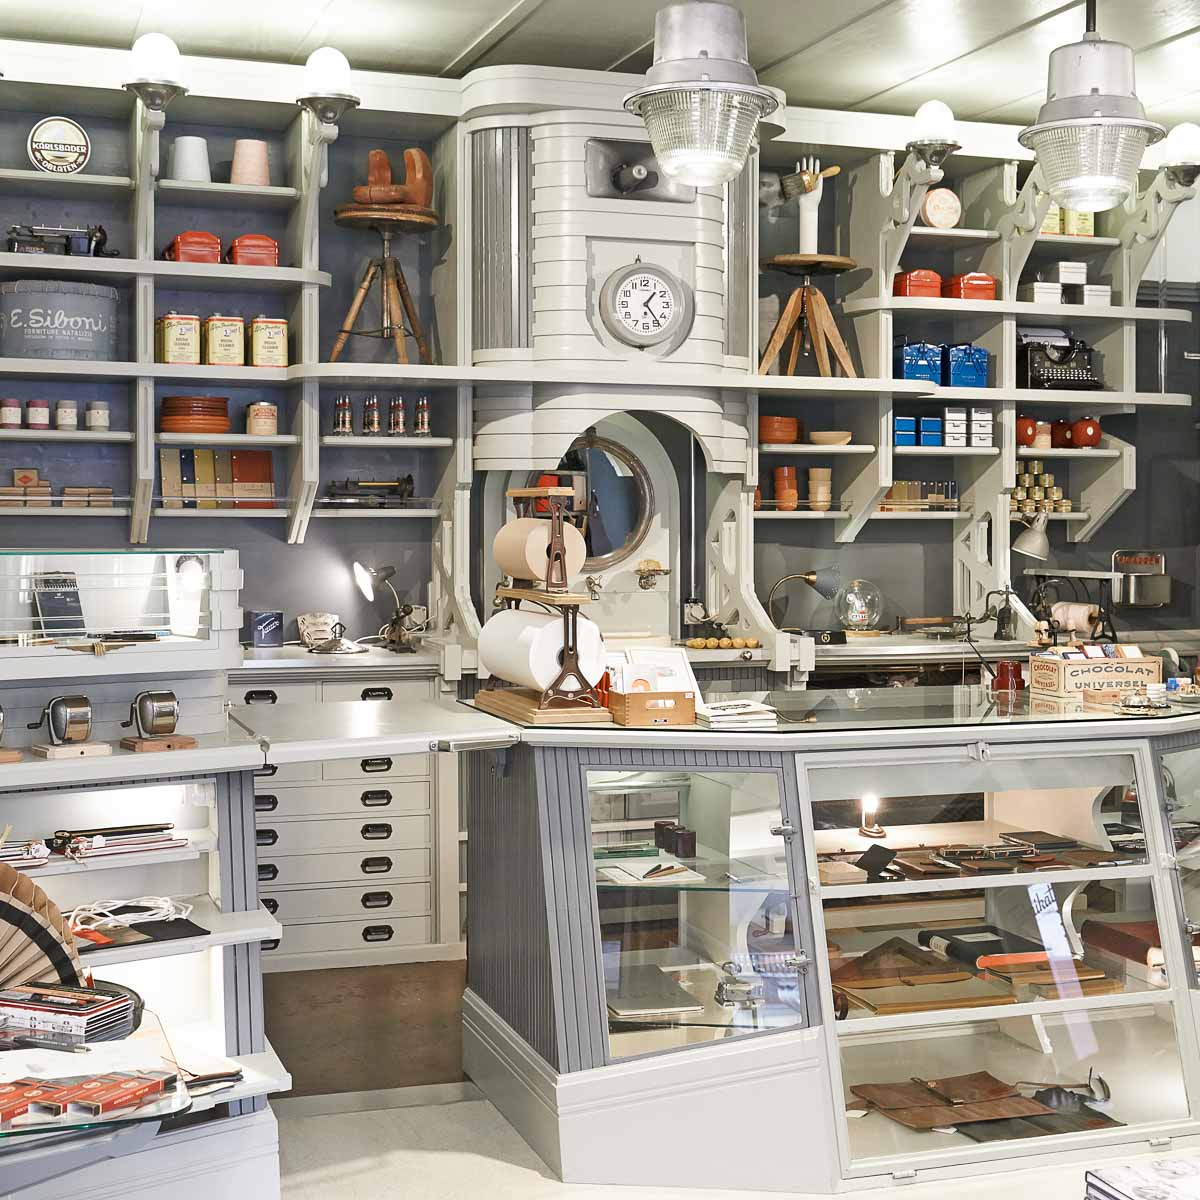 Conecept Store Fabrikat in Zürich